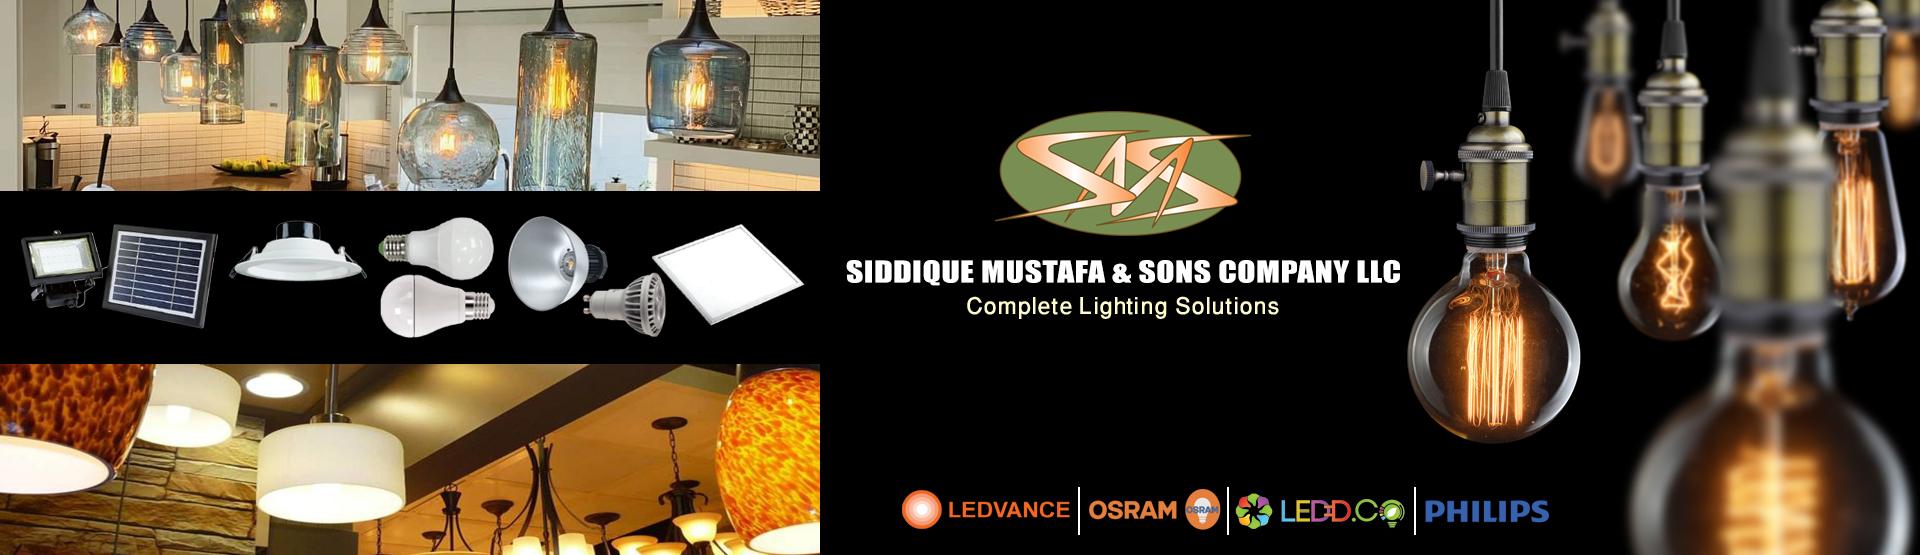 SIDDIQUE MUSTAFA AND SONS COMPANY LLC